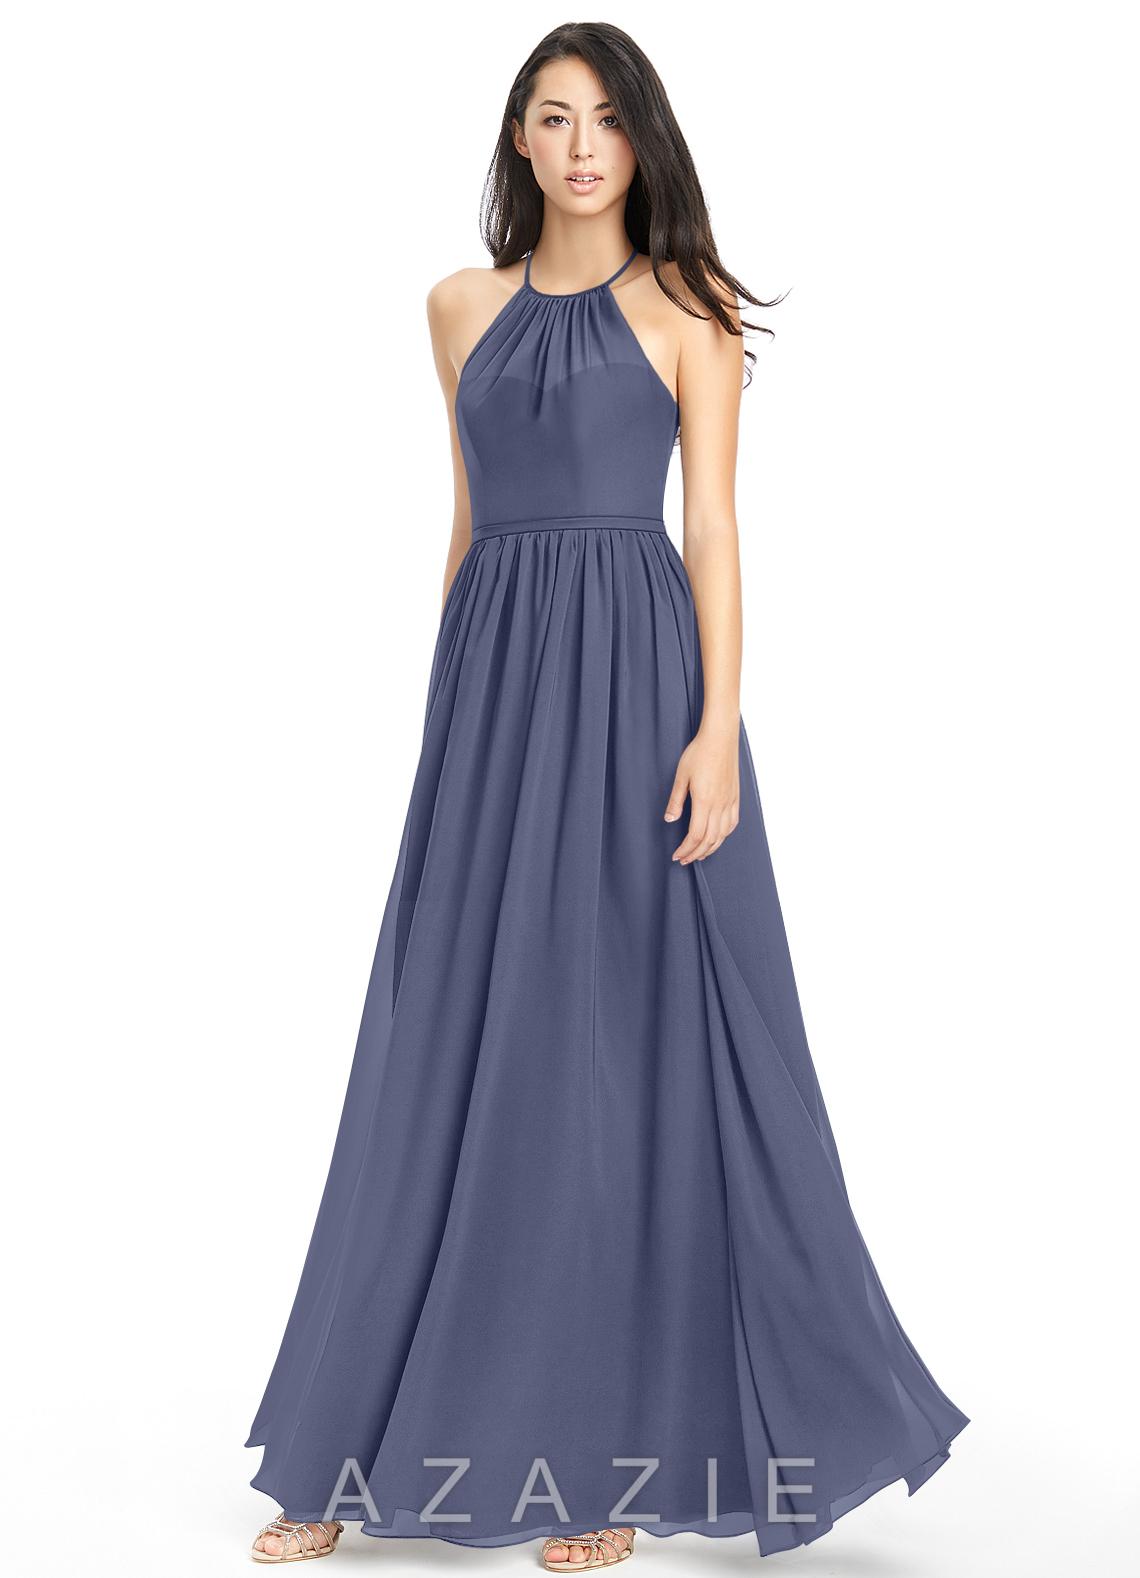 a9c58a7f00 Azazie Kailyn Bridesmaid Dress - Stormy